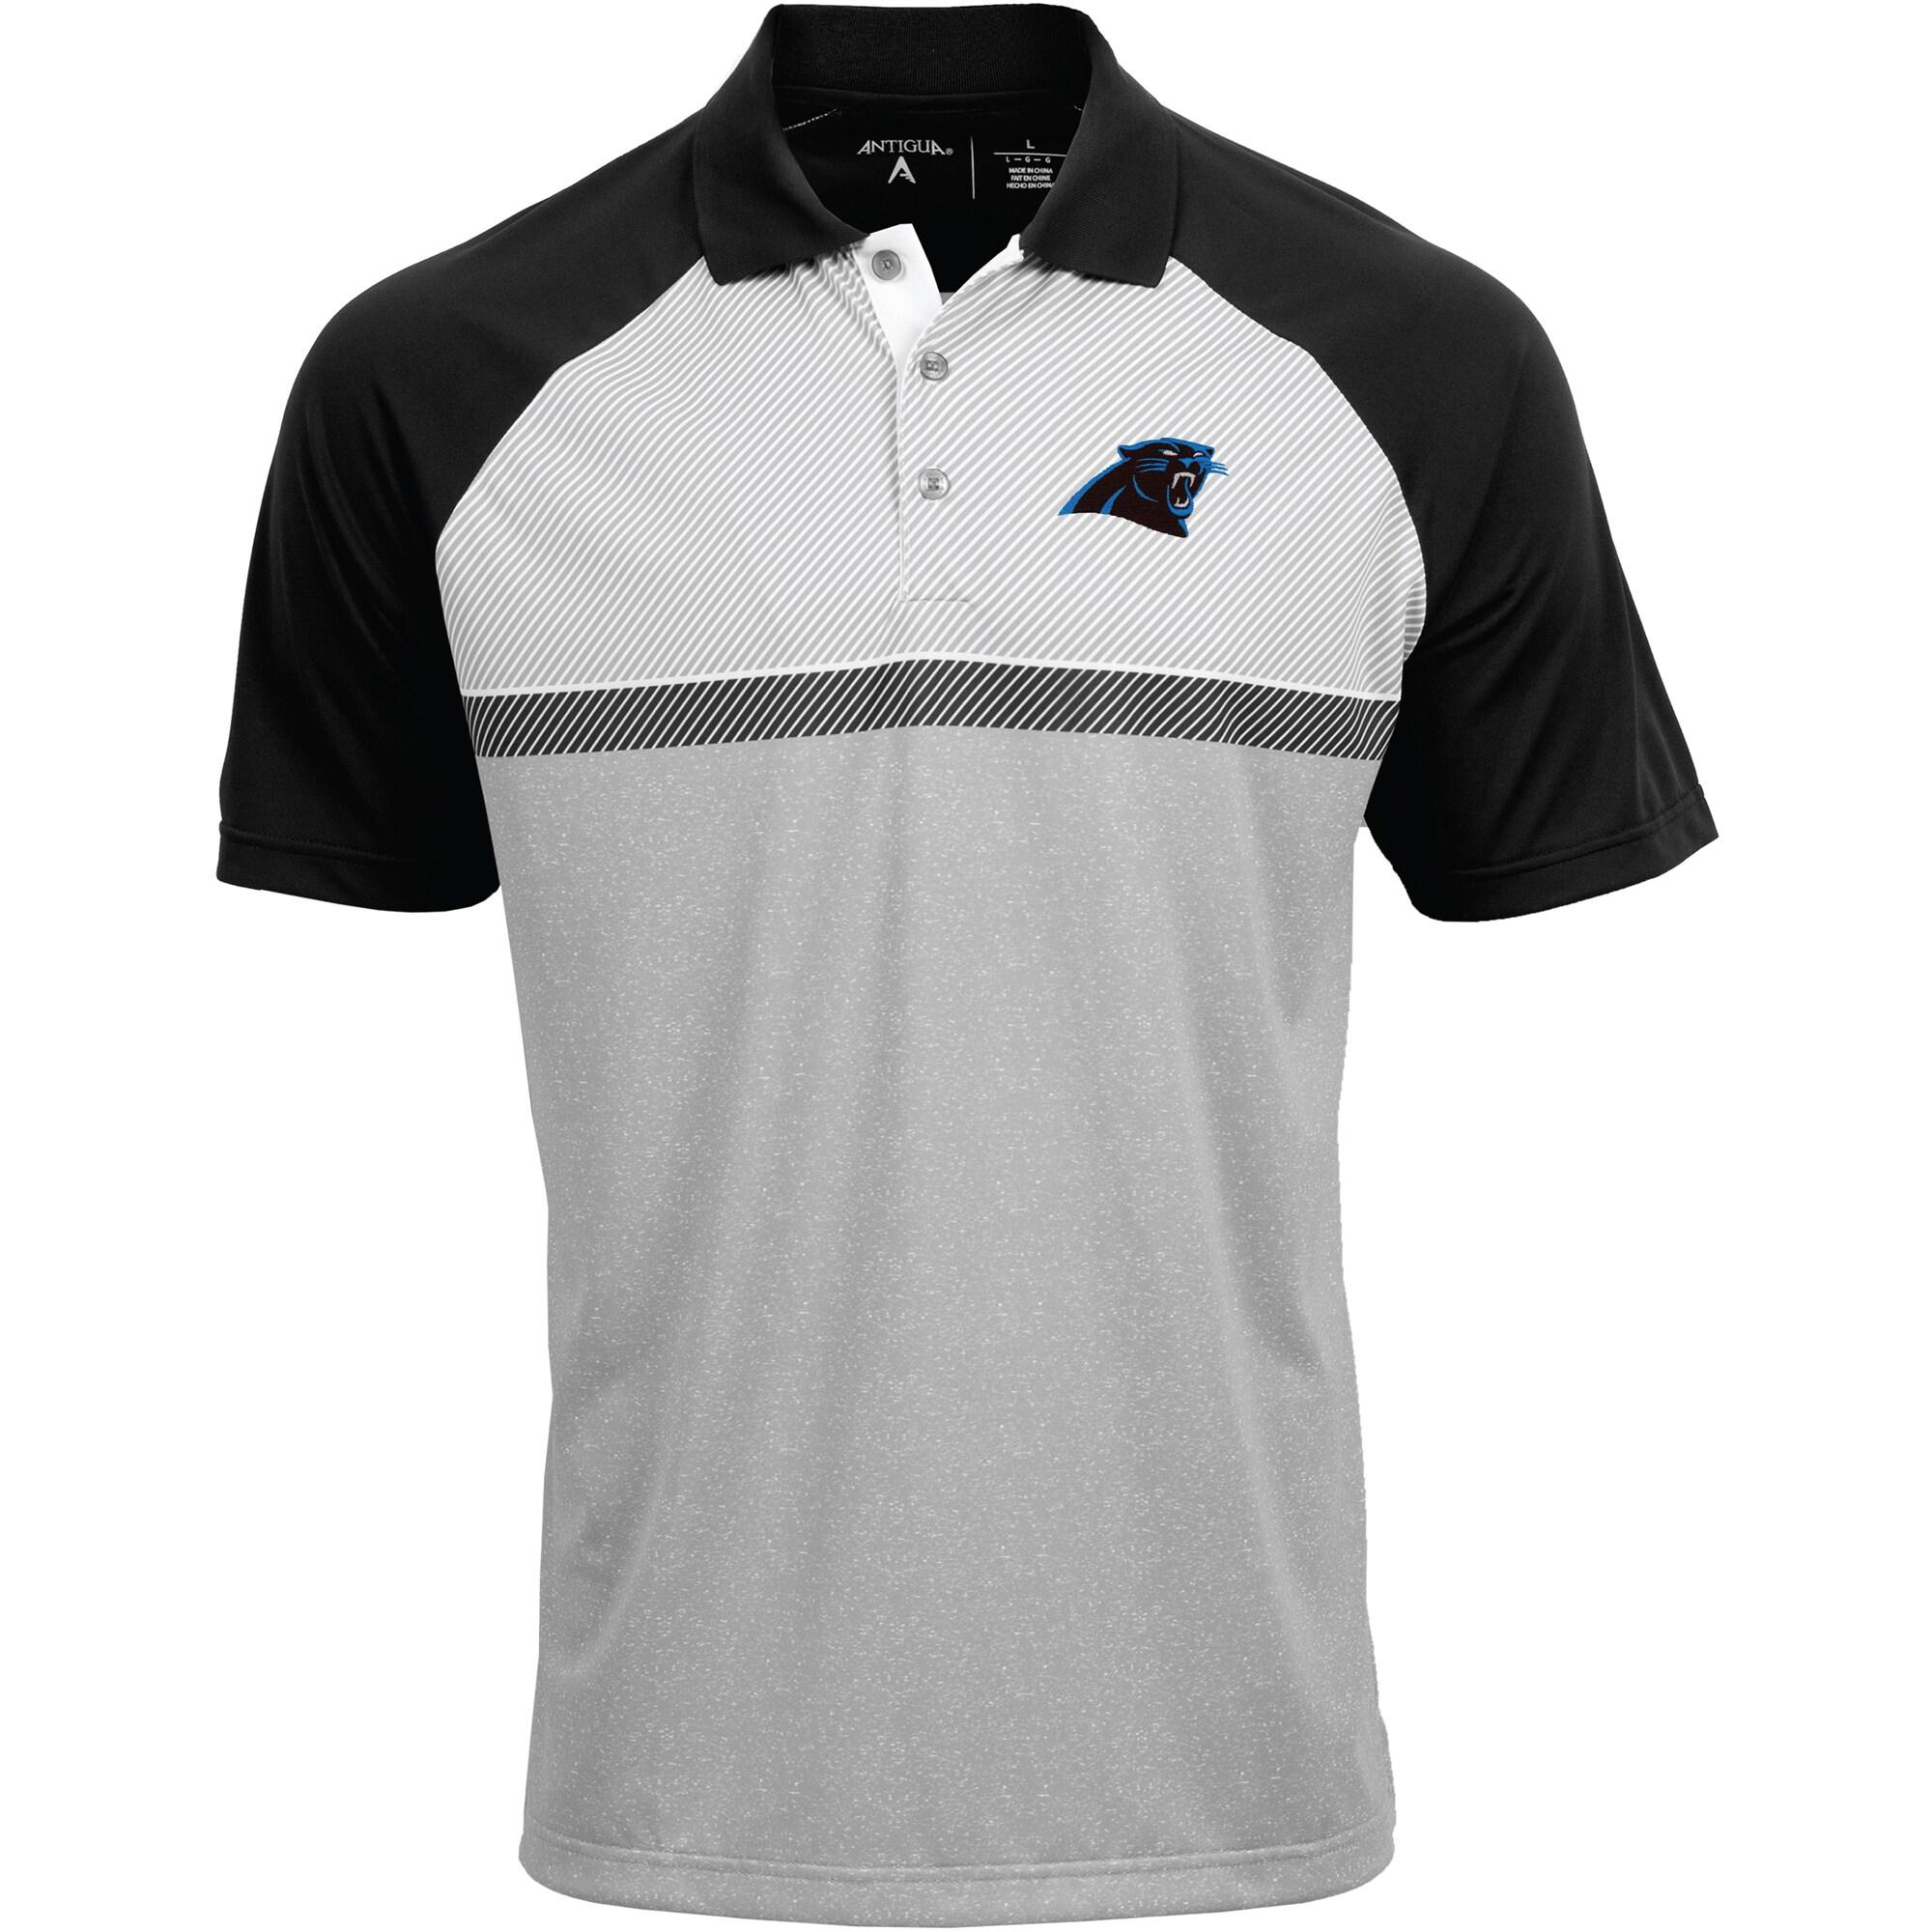 Carolina Panthers Antigua Momentum Polo - Gray/Black